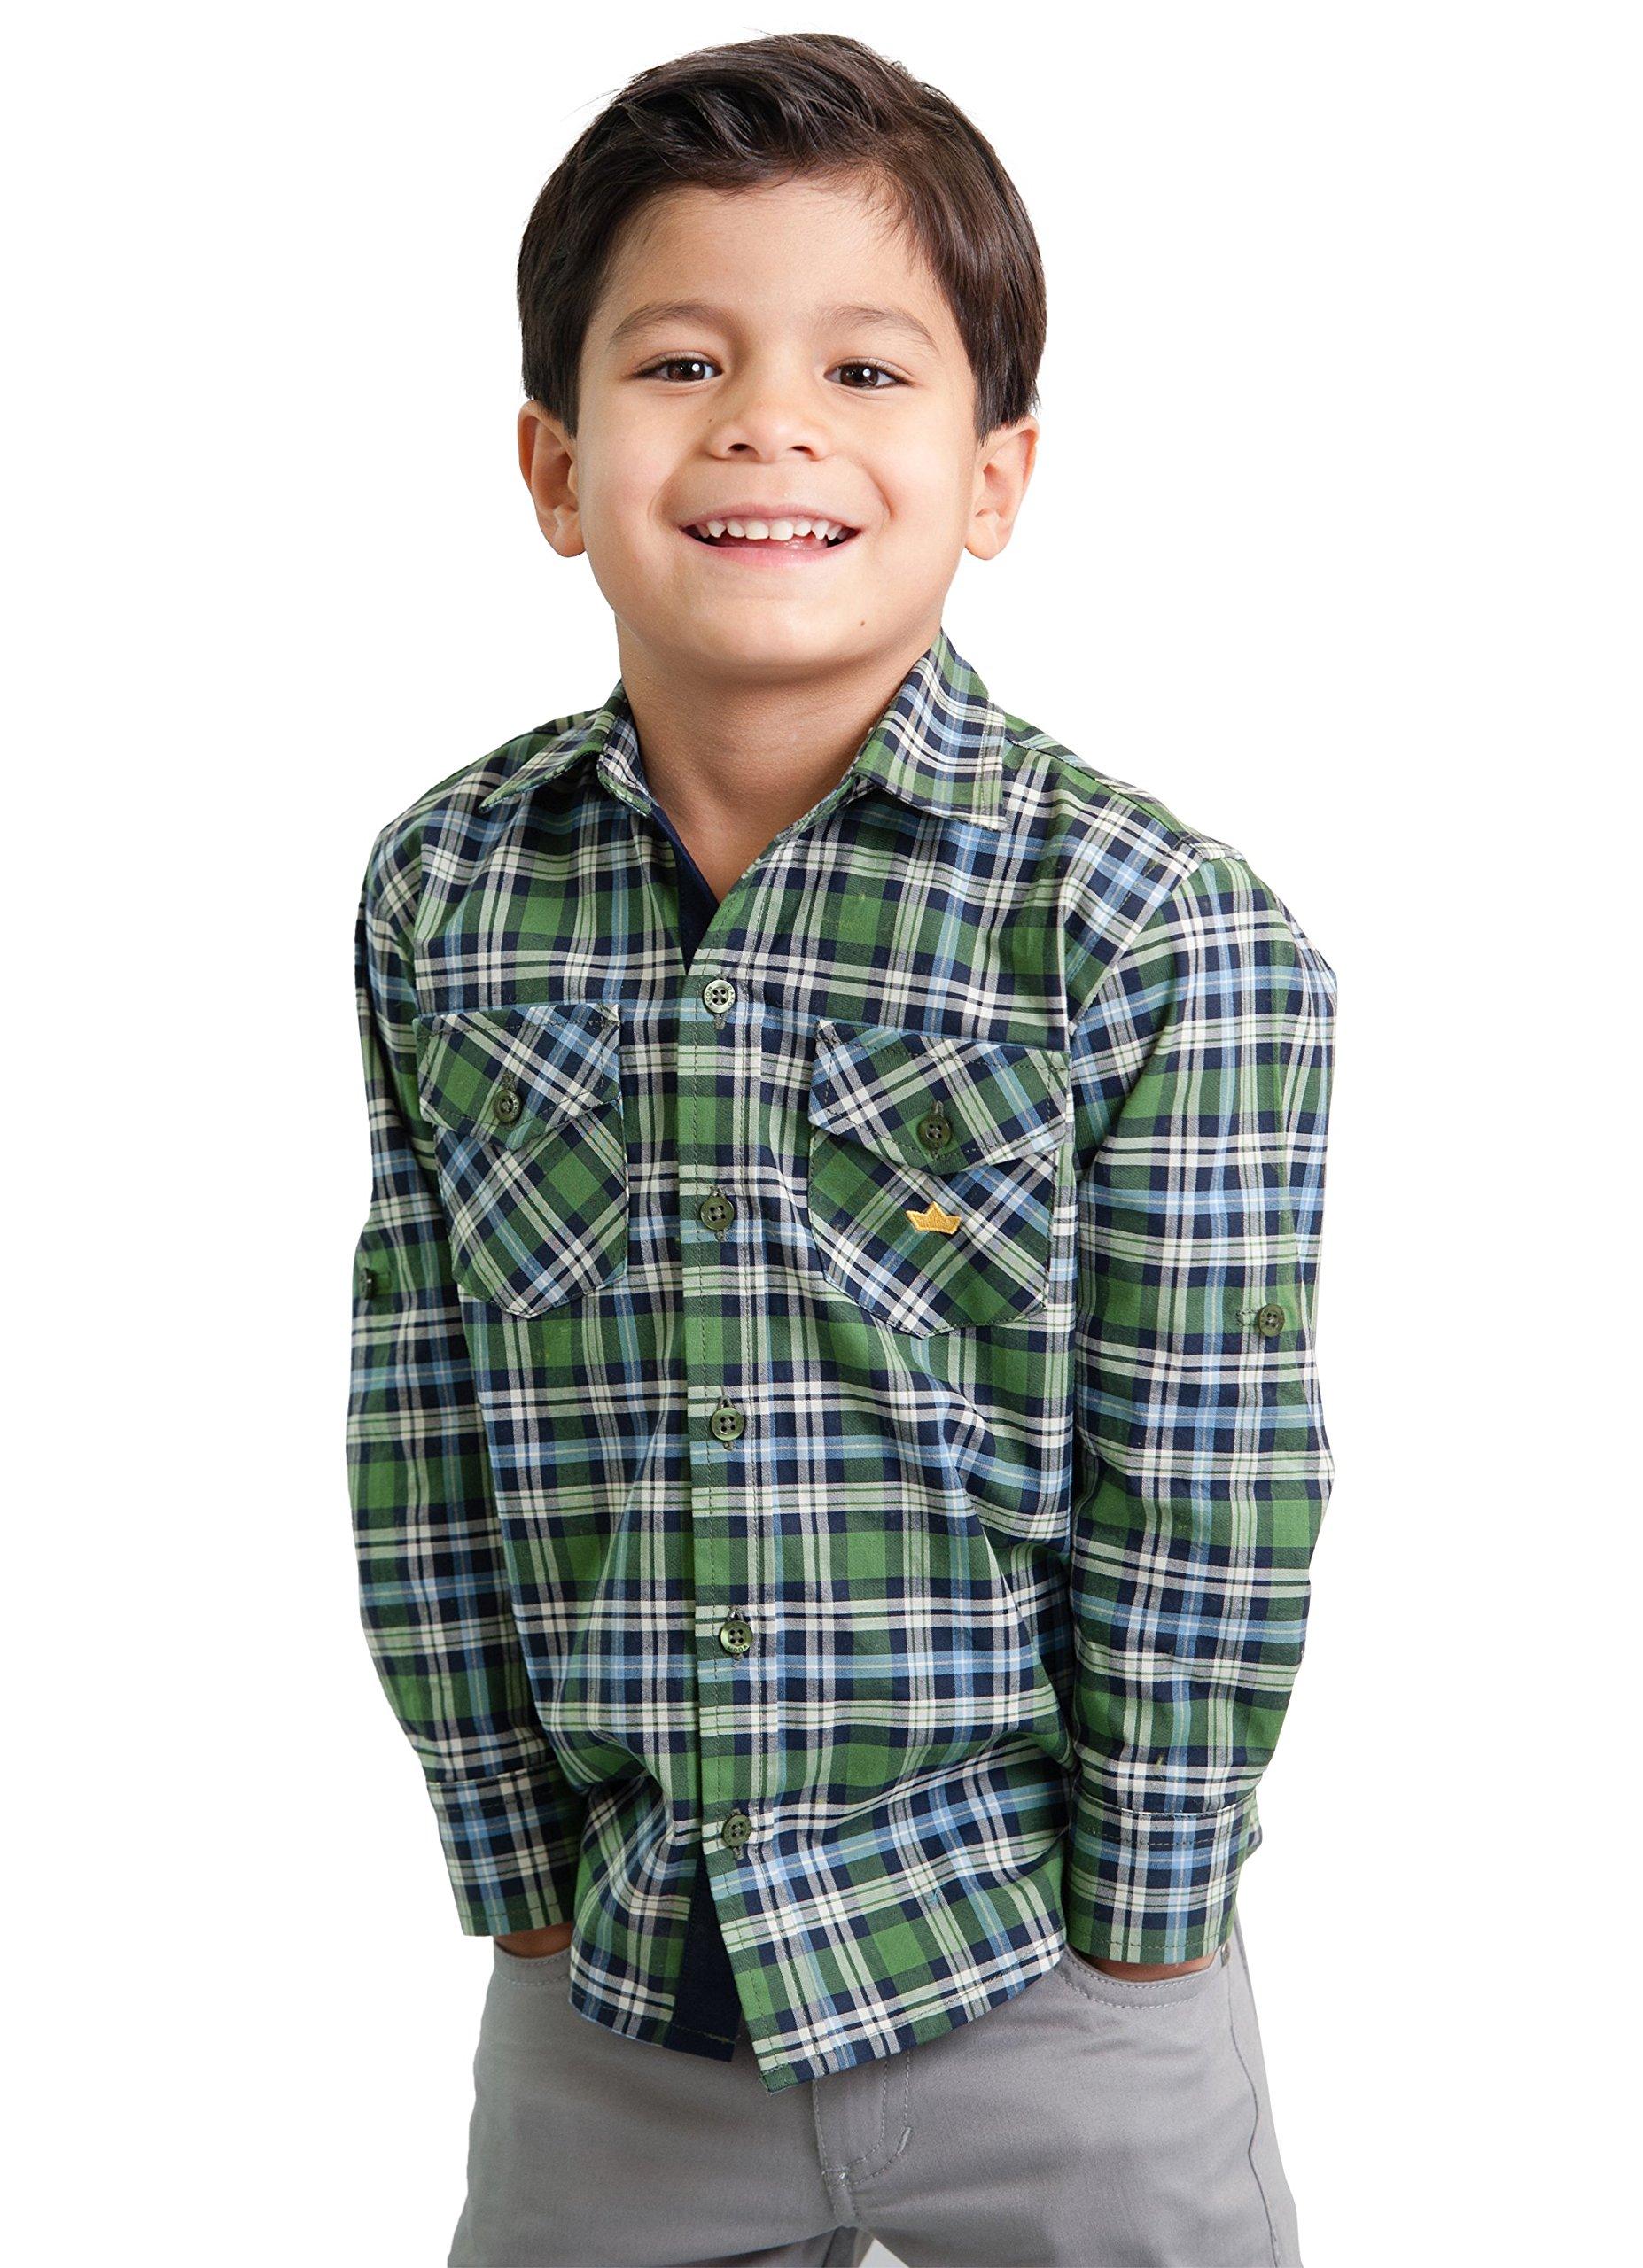 Dakomoda Toddler Boys' 100% Pima Cotton Green Shirt - Plaid Western Check Roll Up Dress Shirt 7